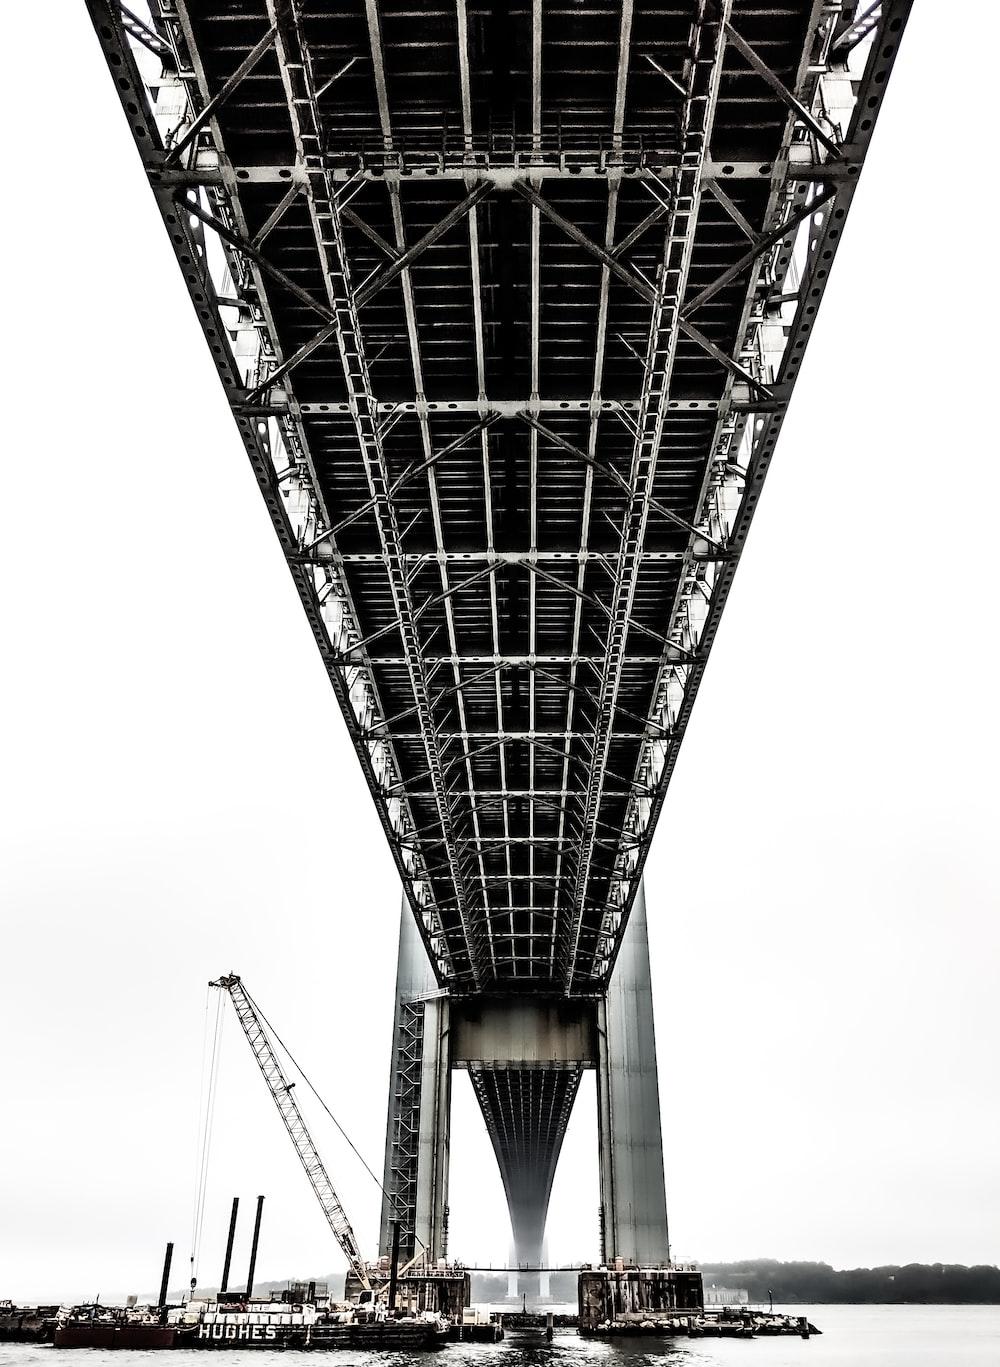 boats under black metal bridge at daytime